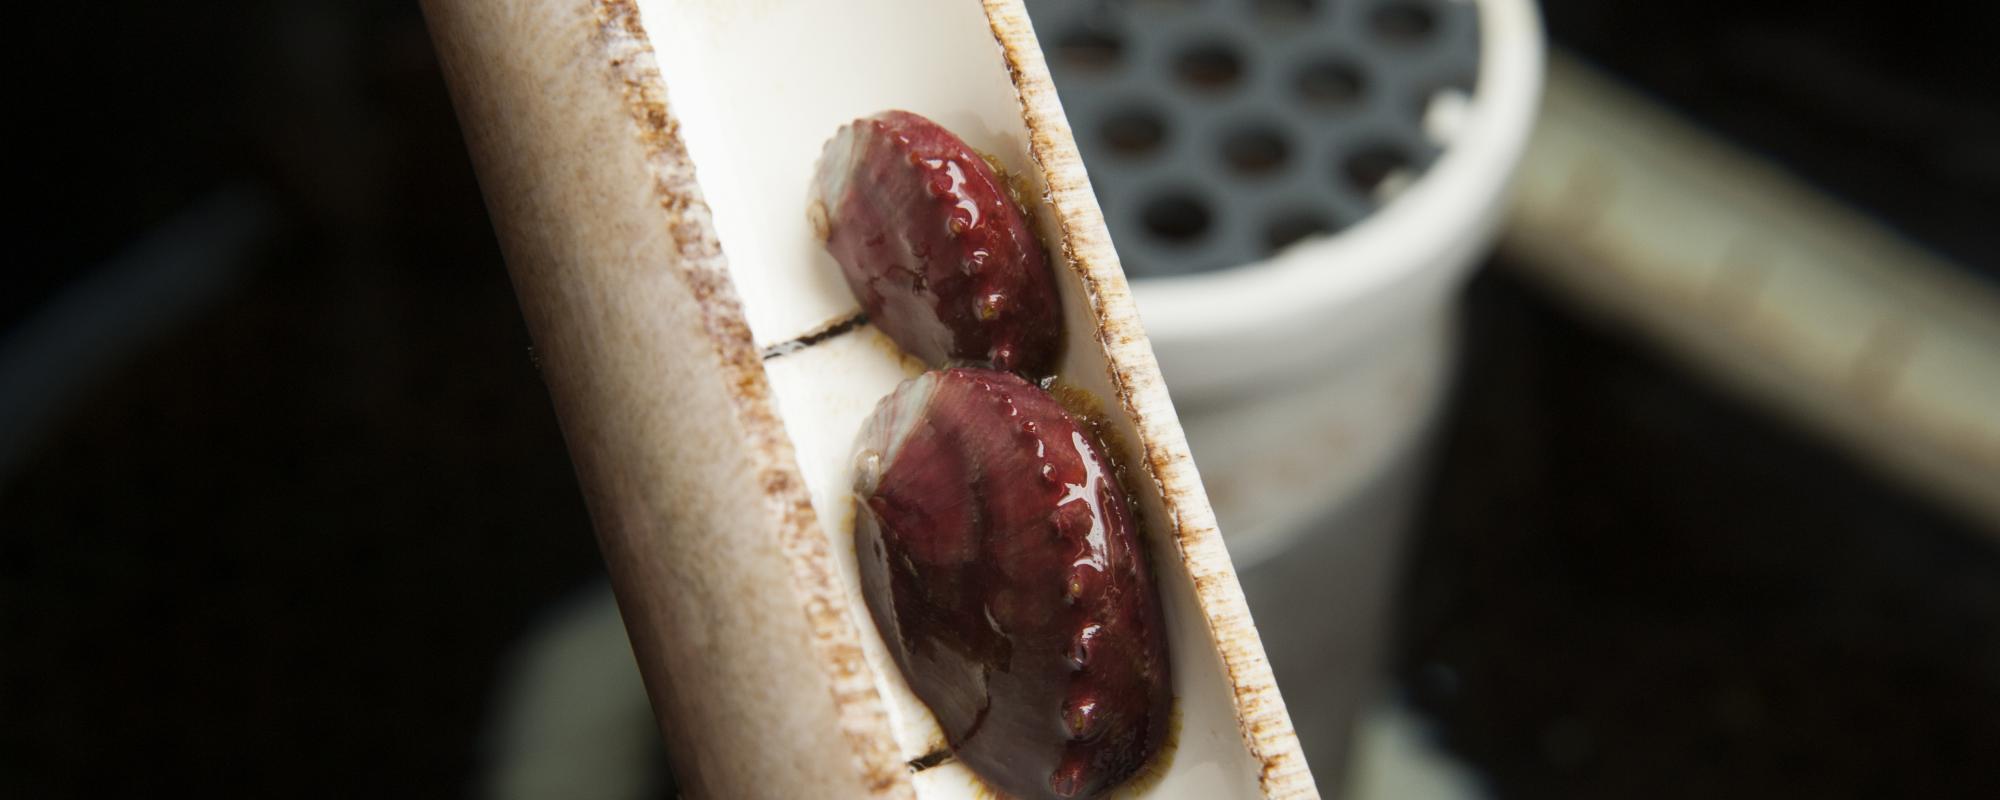 Juvenile white abalone bred at UC Davis Bodega Marine Laboratory